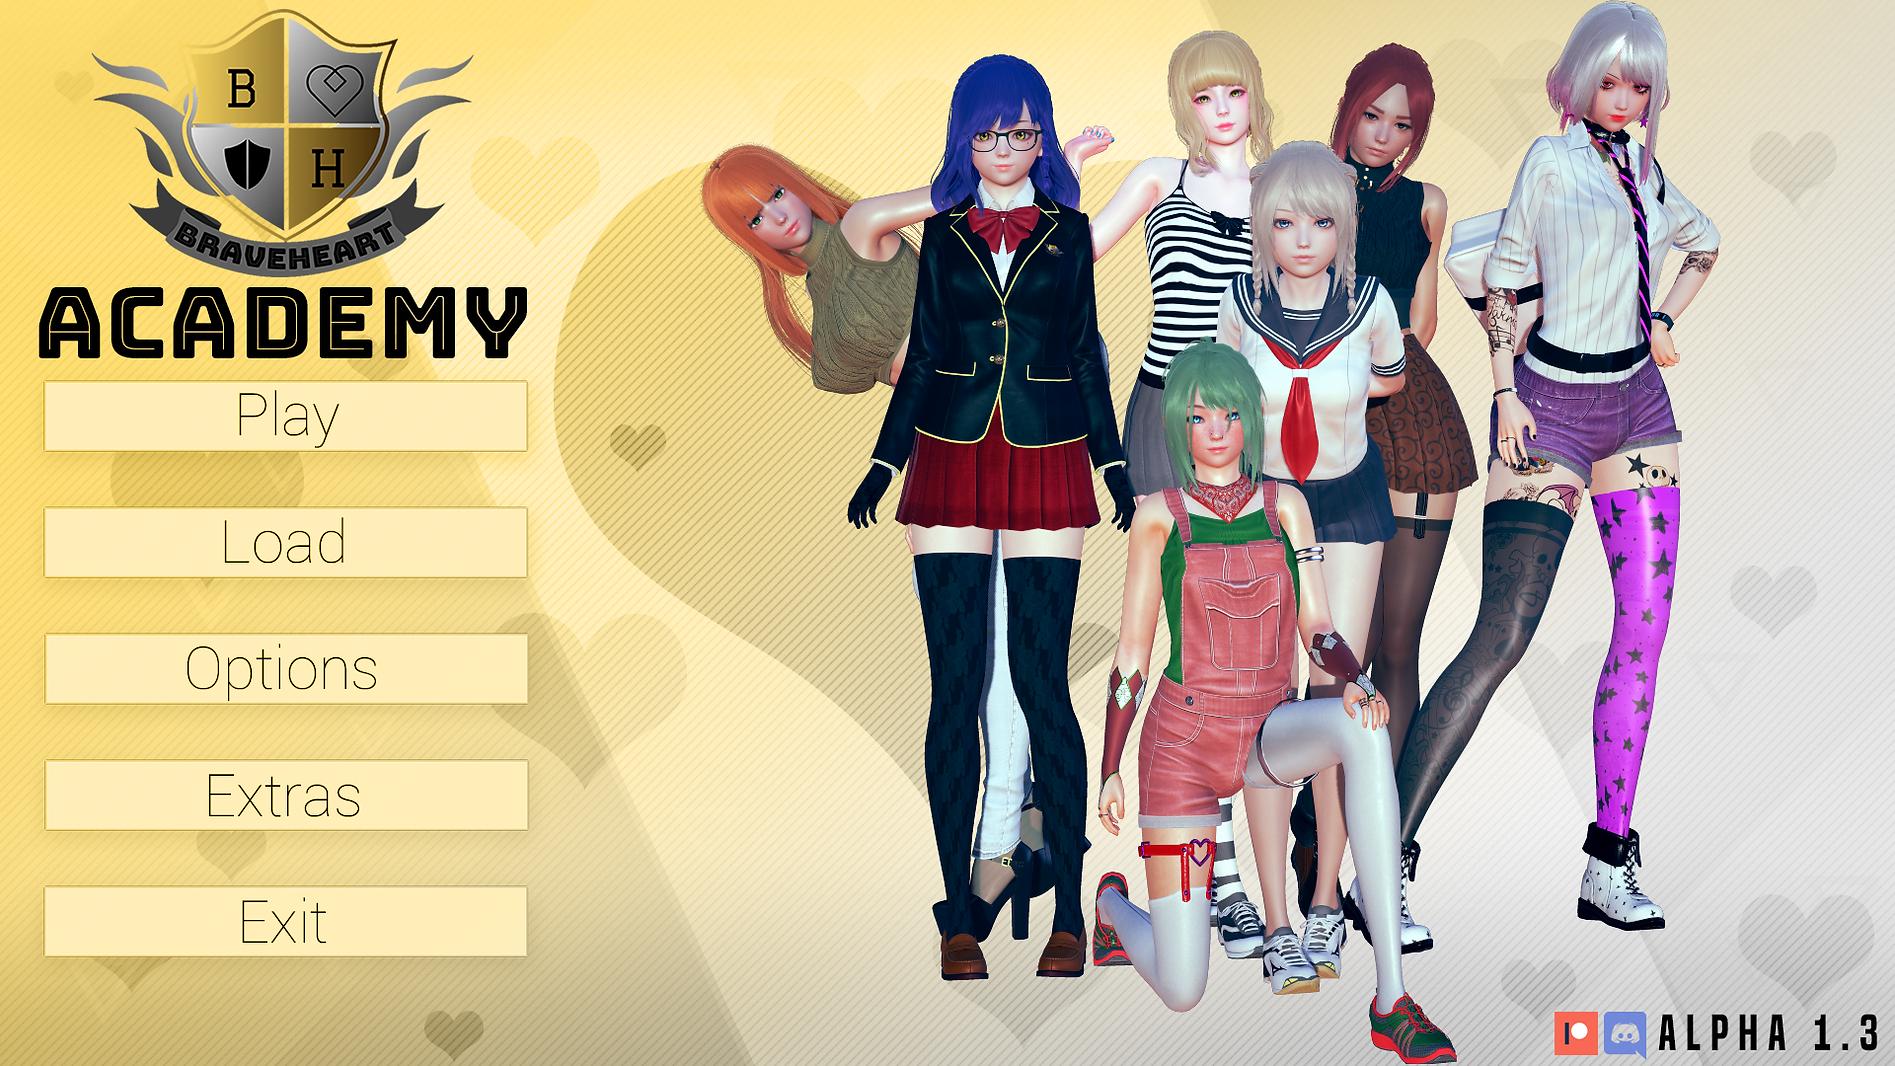 Braveheart Academy Main - Haru's Harem.p